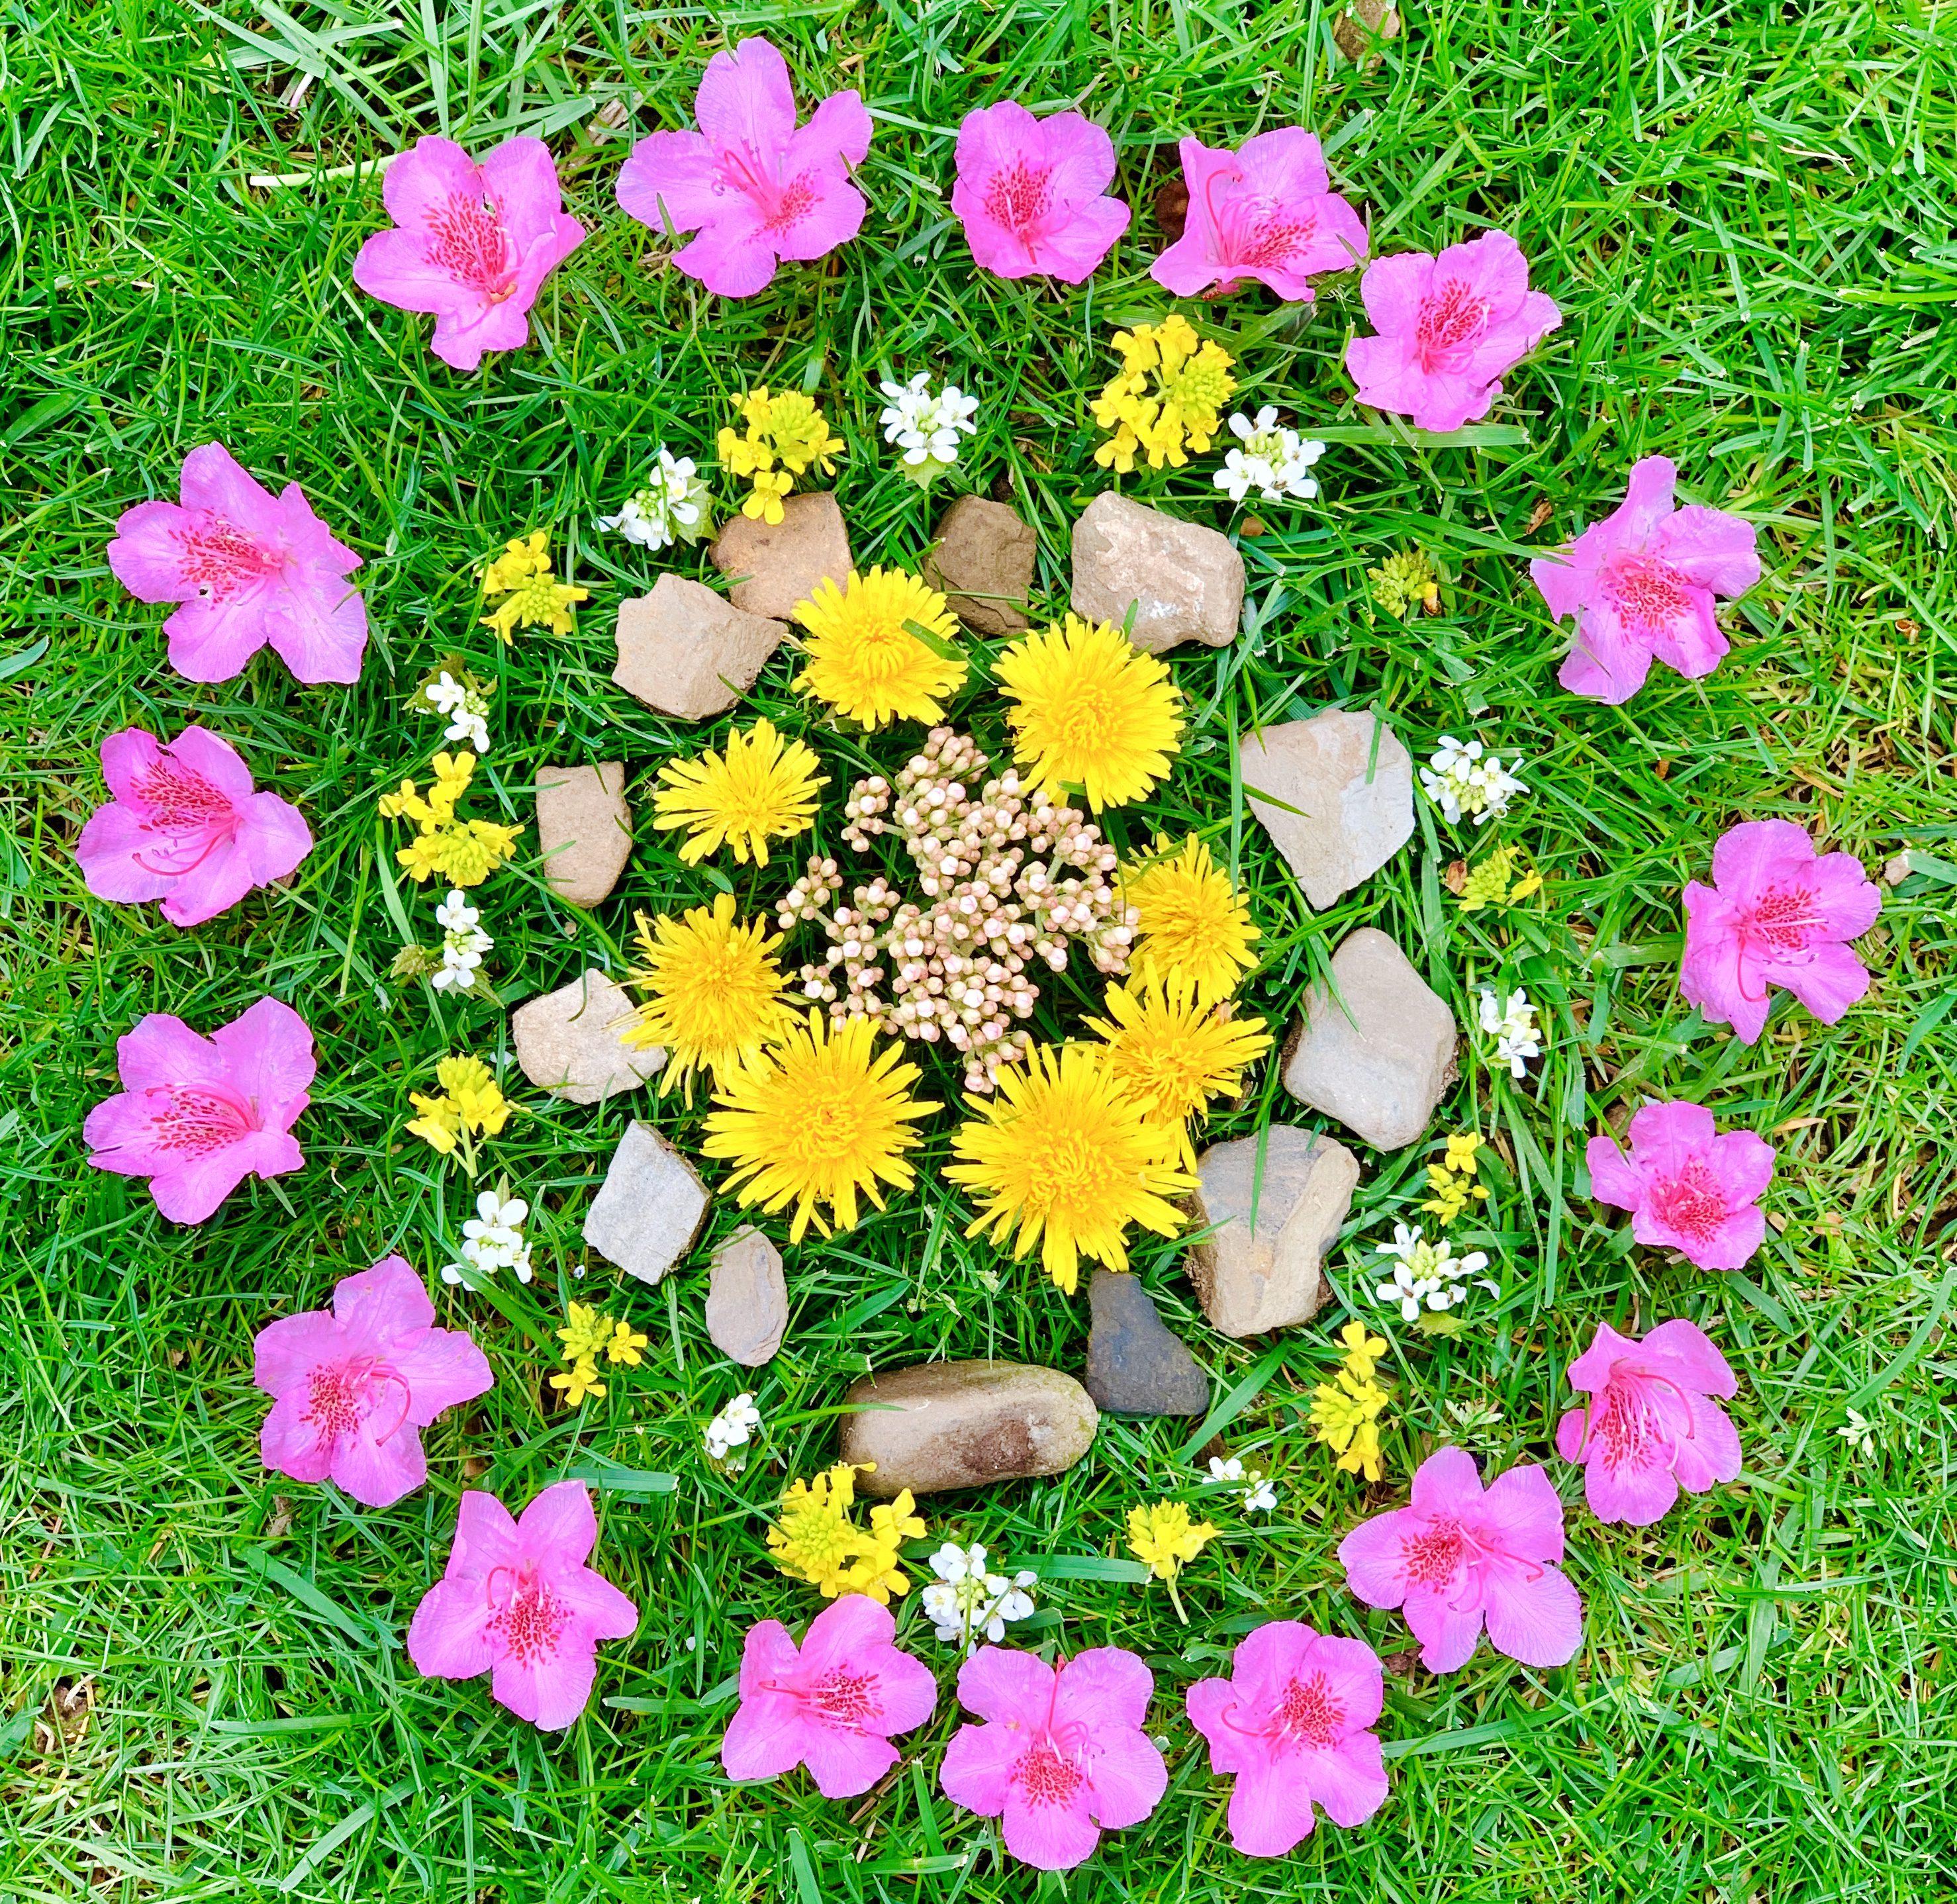 Outdoors-Nature-Mandala